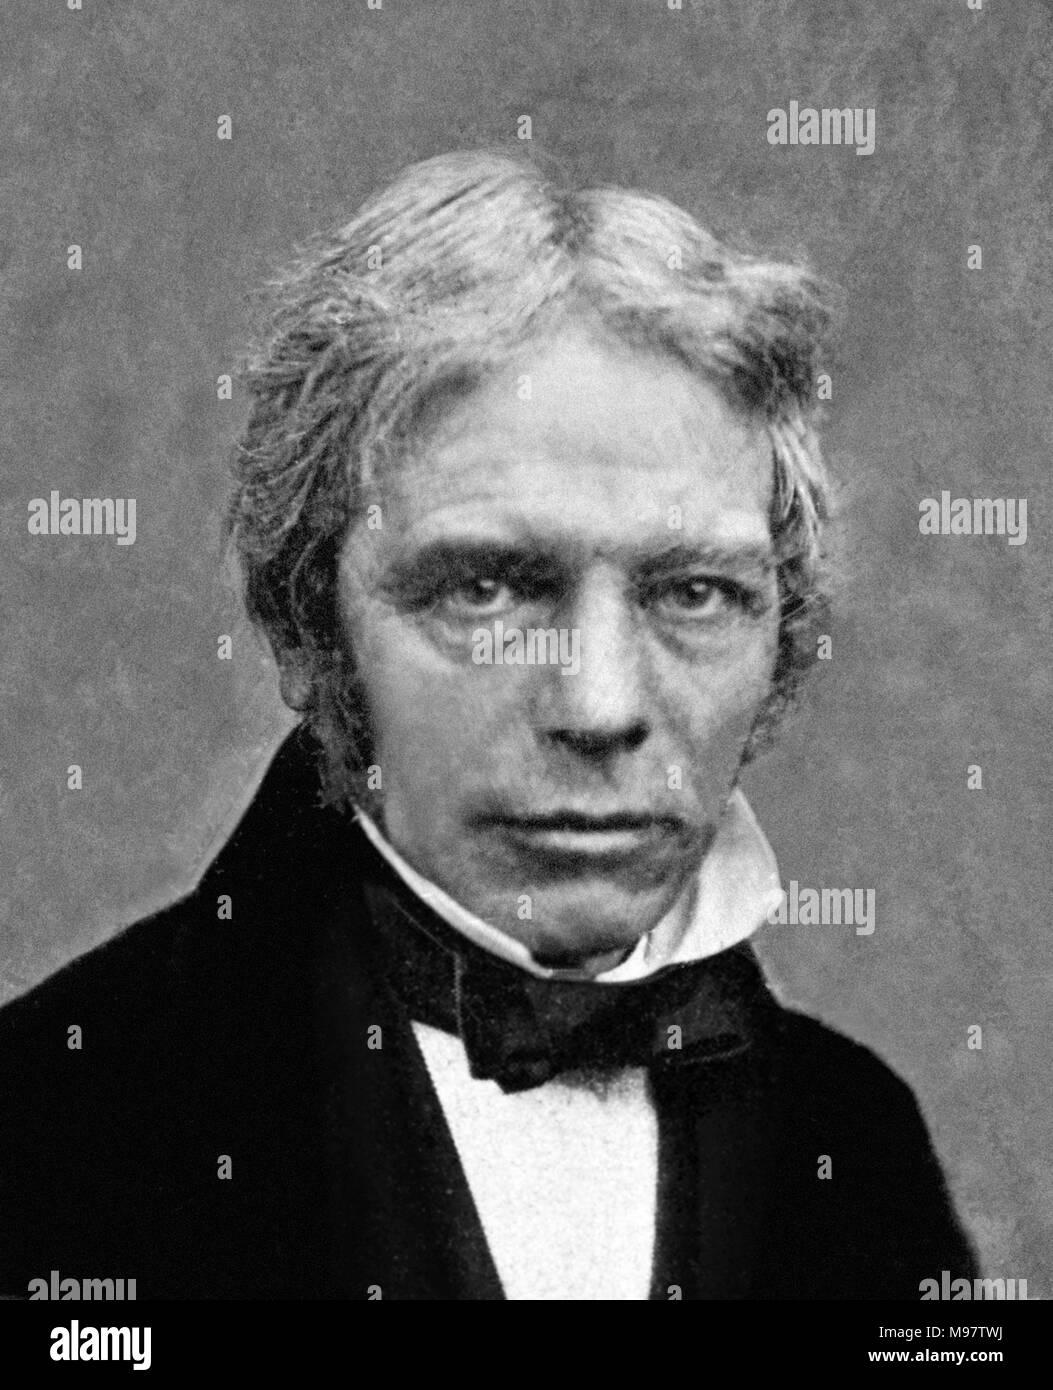 Michael Faraday (1791-1867), daguerrotype portrait by the studio of Matthew Brady, taken between 1840 and 1860. - Stock Image